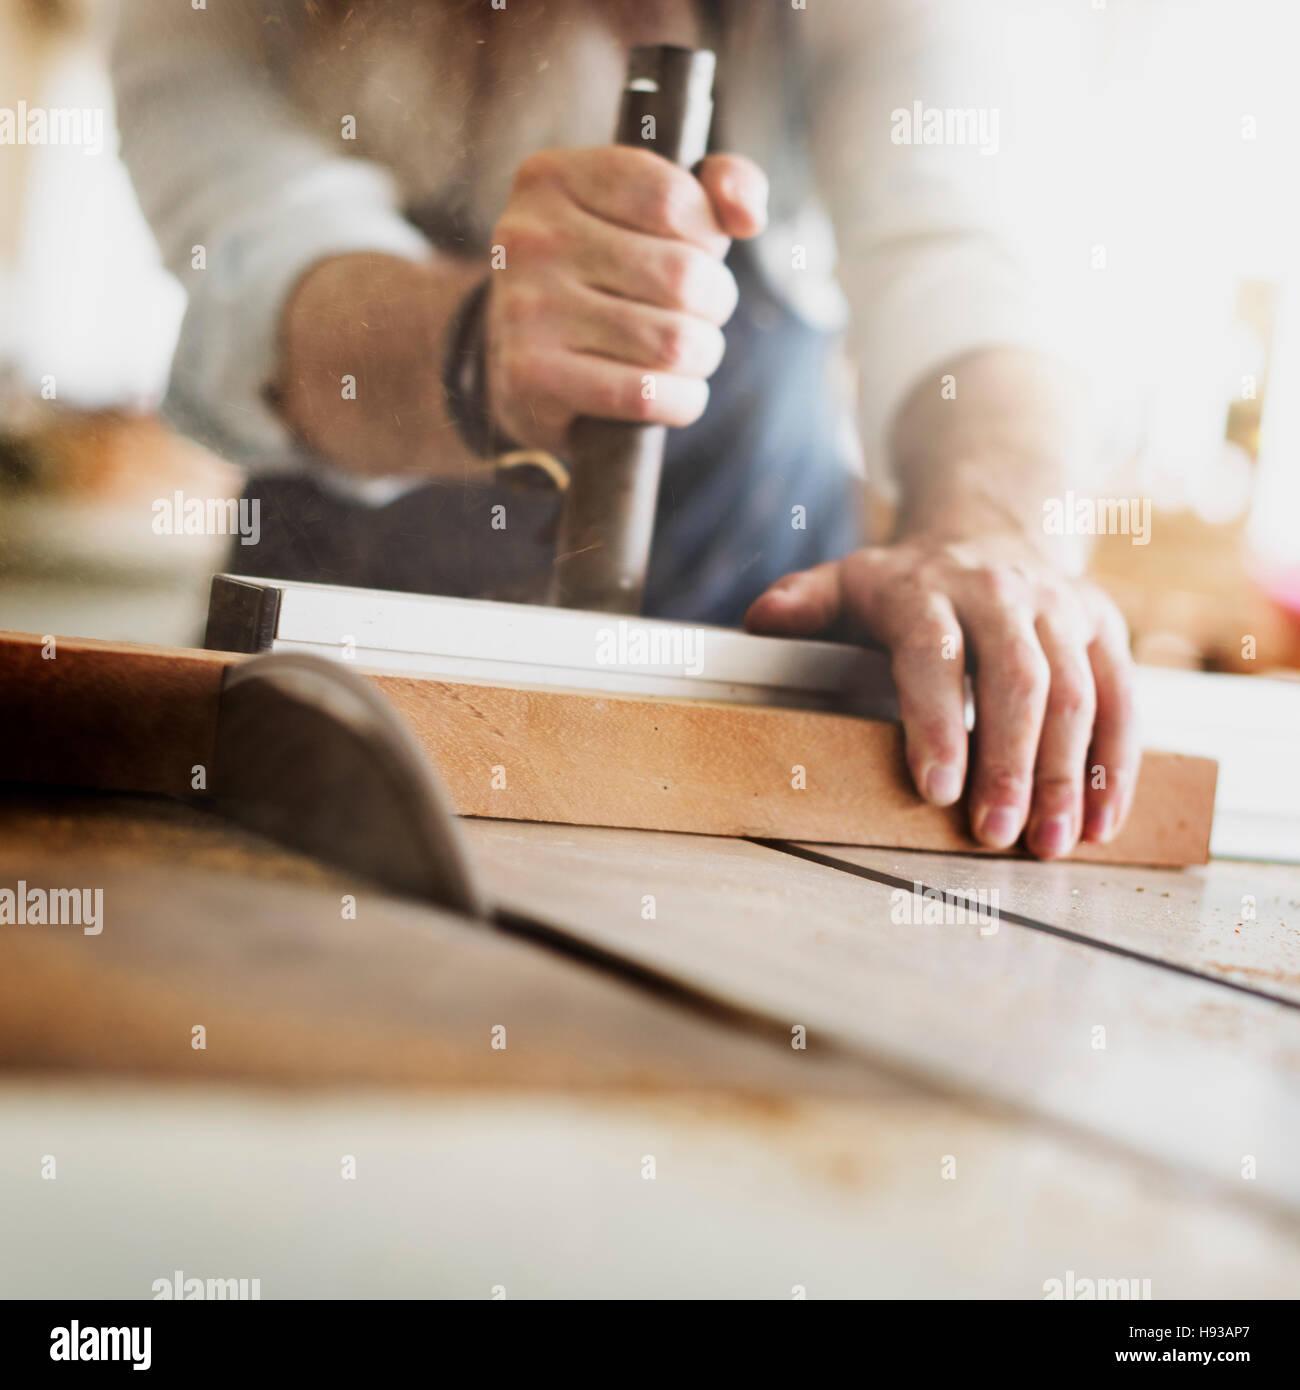 Búsqueda ocupación profesión artesano concepto cualificados Imagen De Stock